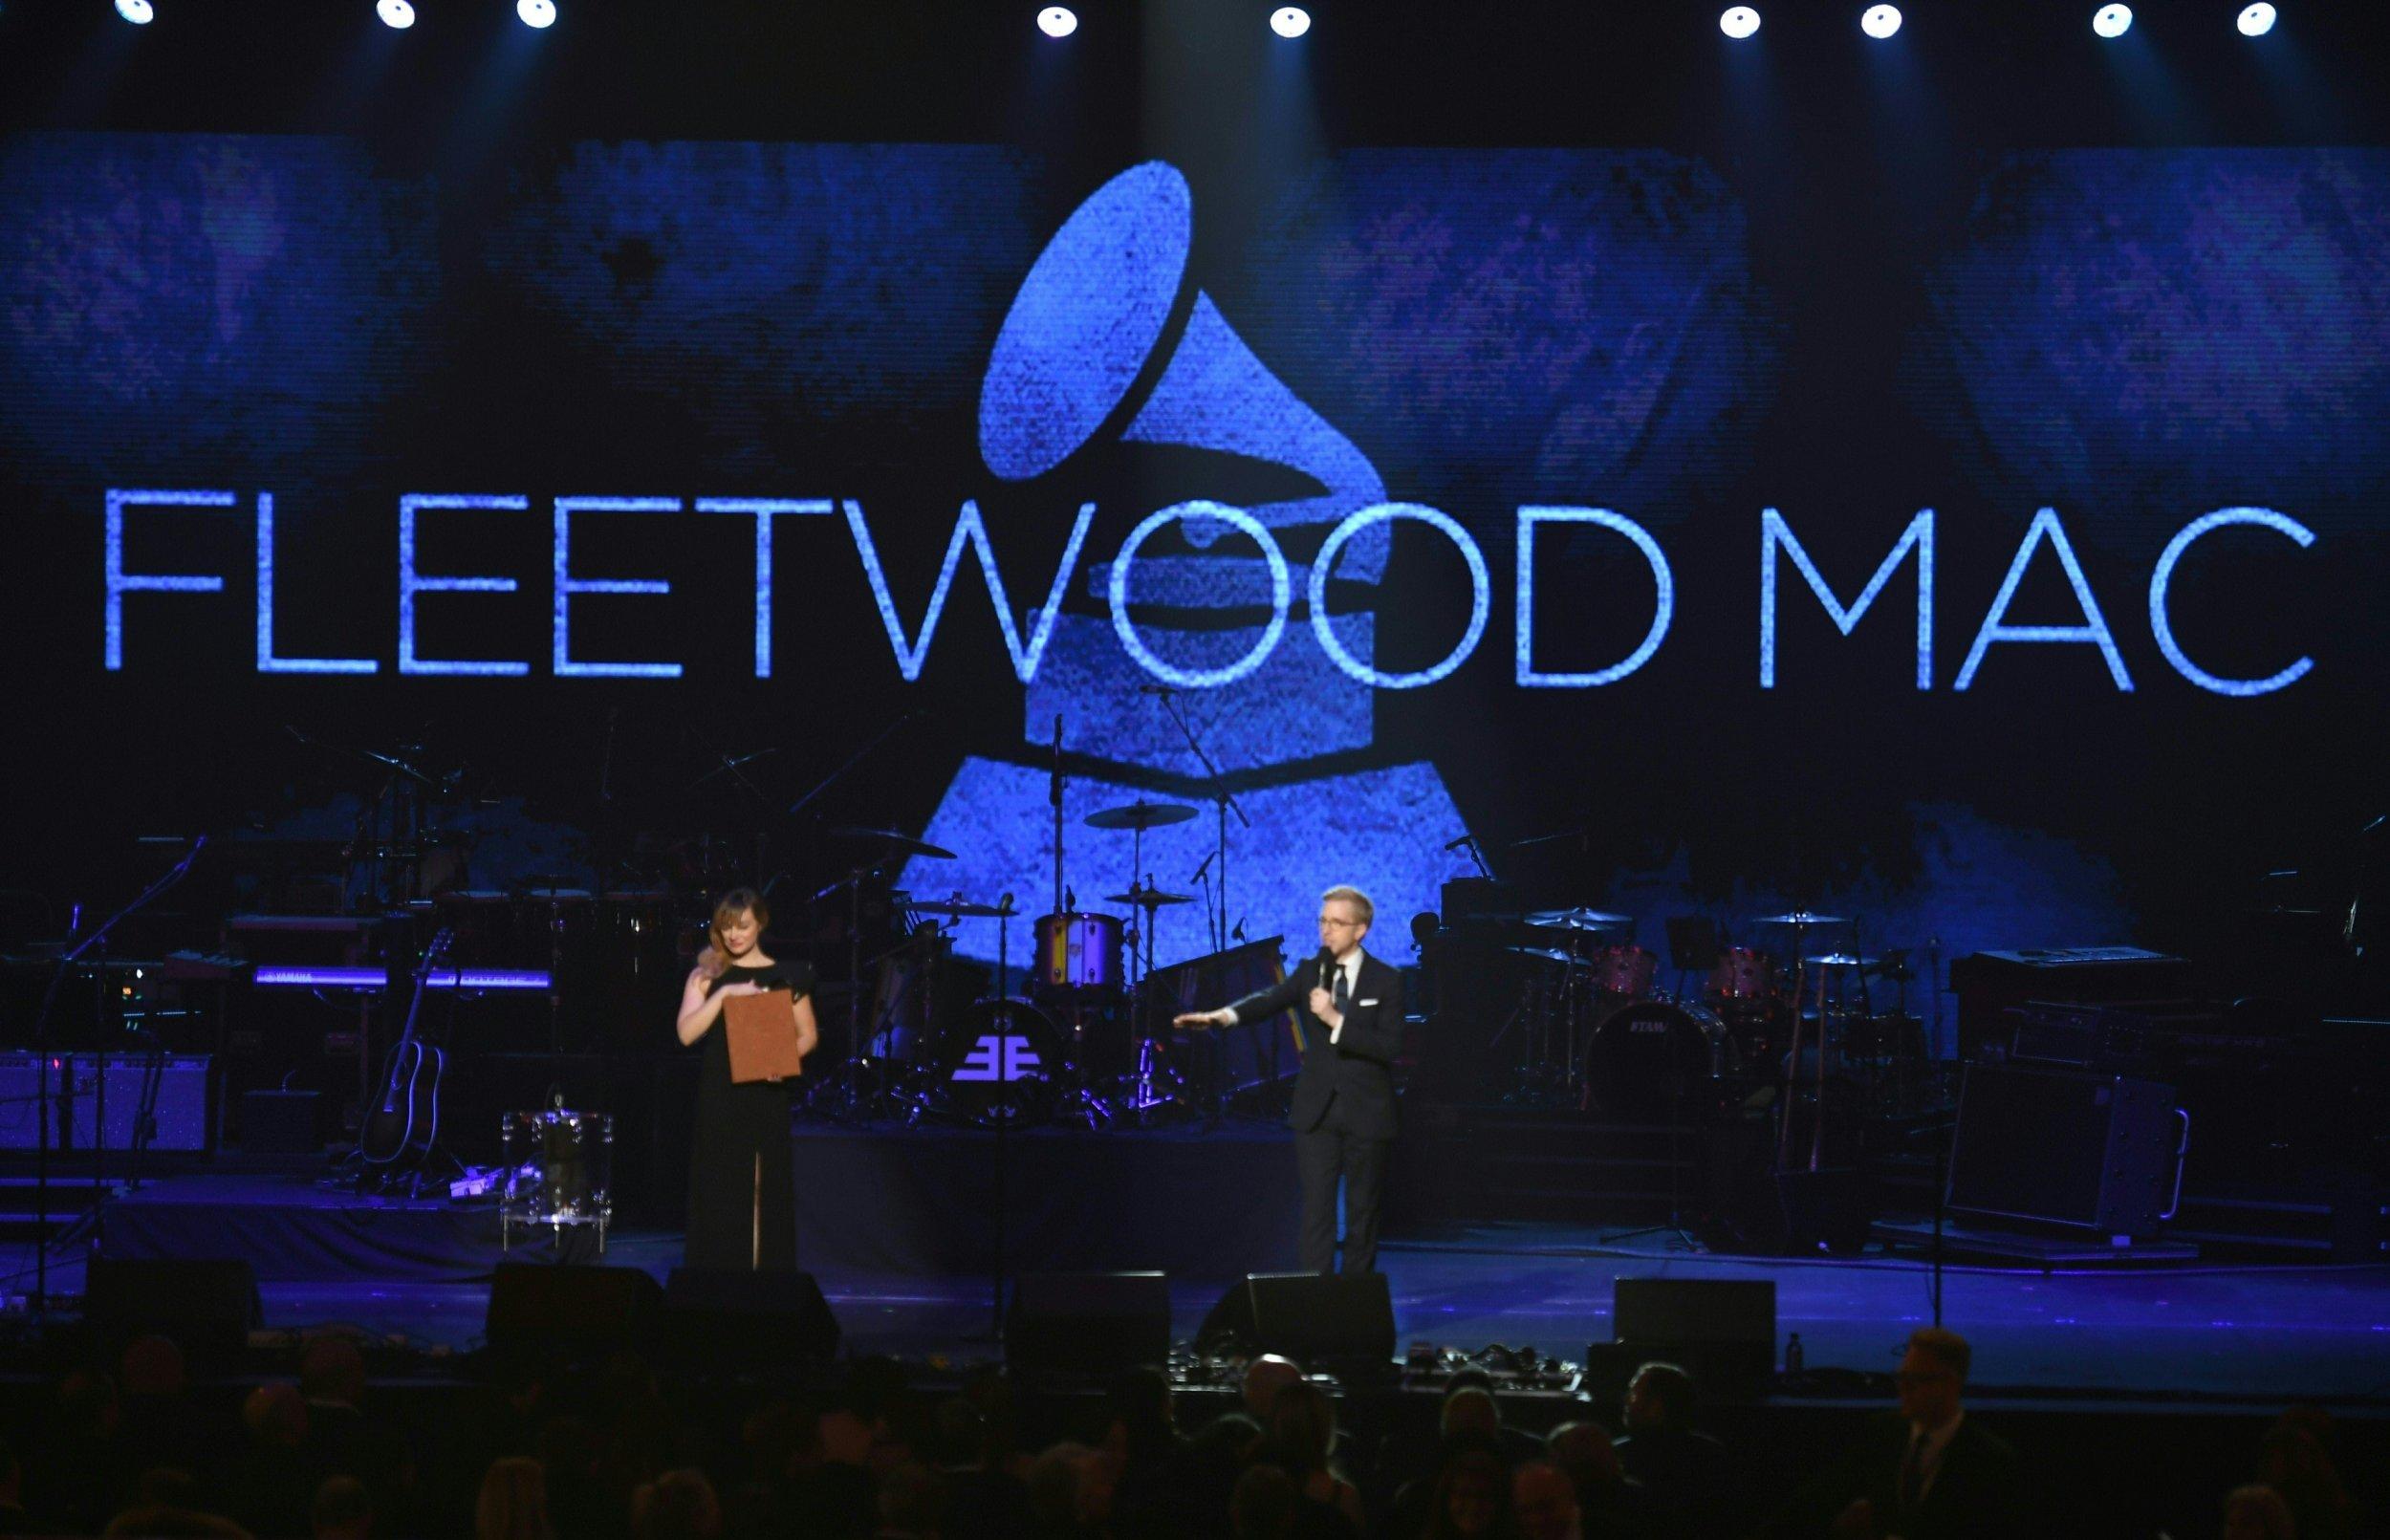 Fleetwood Mac death: Guitarist Danny Kirwan dead at 68